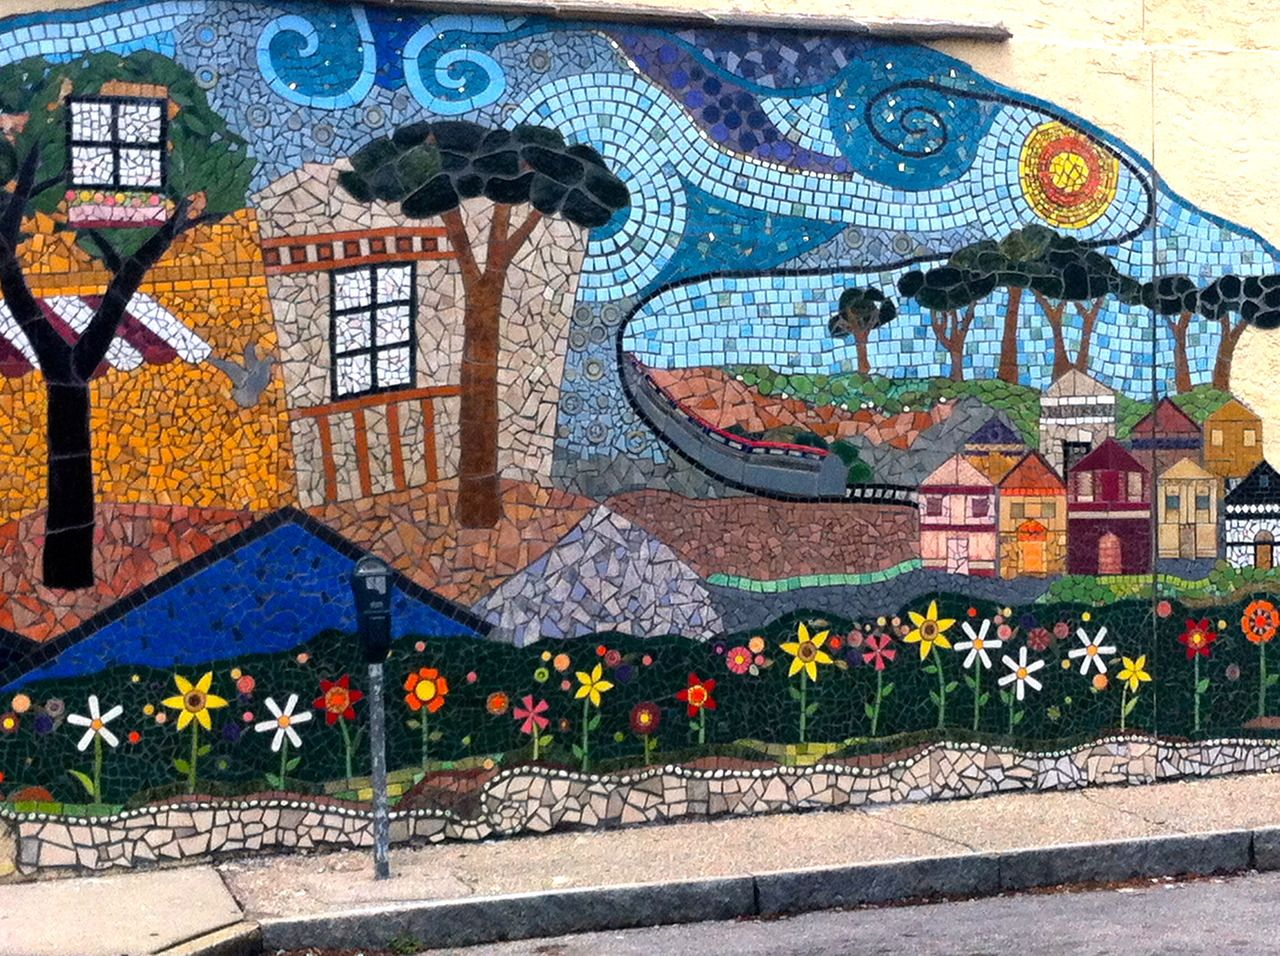 mosaic wall art mural art mosaic art